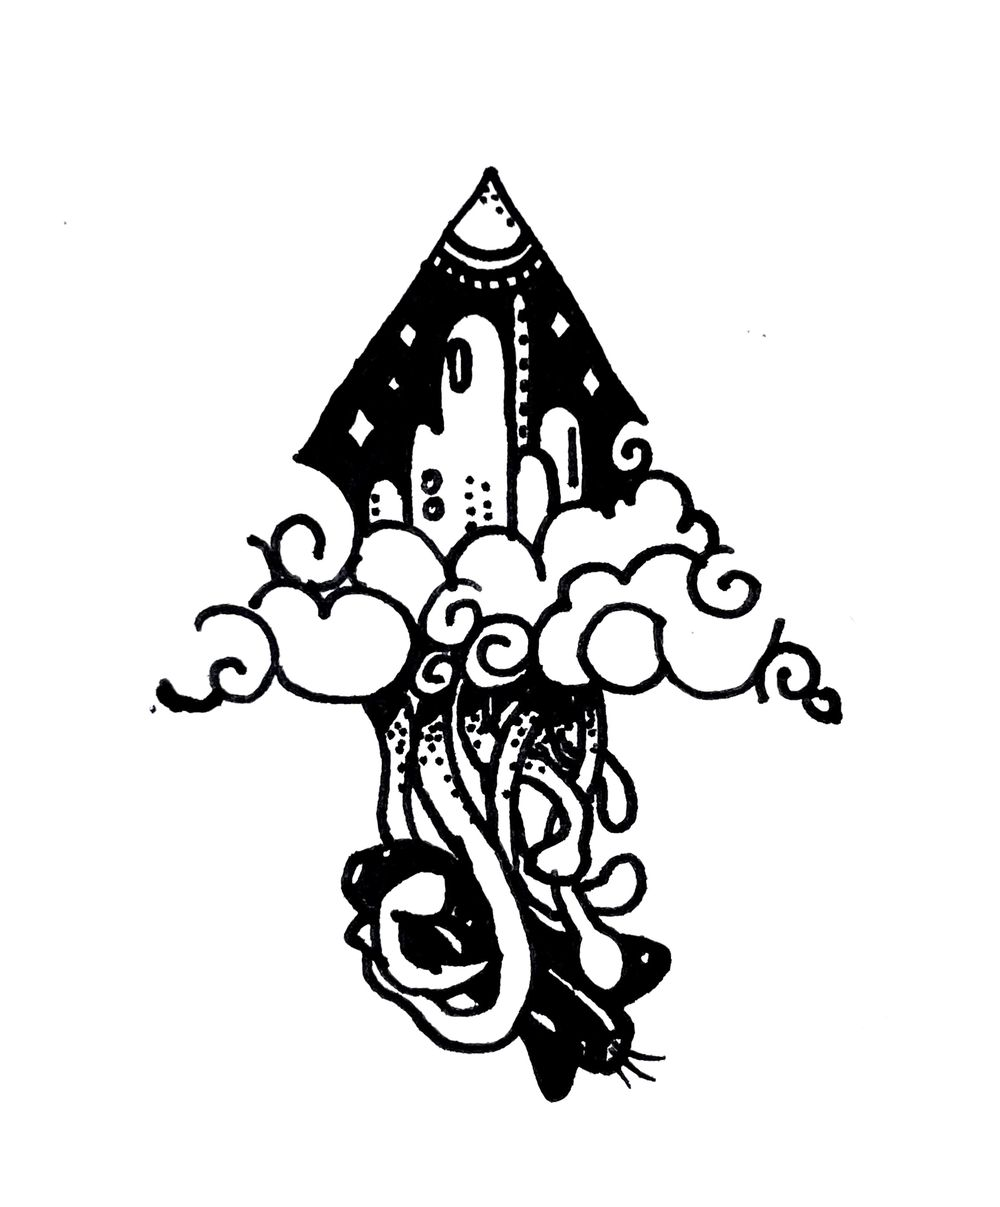 Tiny tiny tentacle world - image 1 - student project